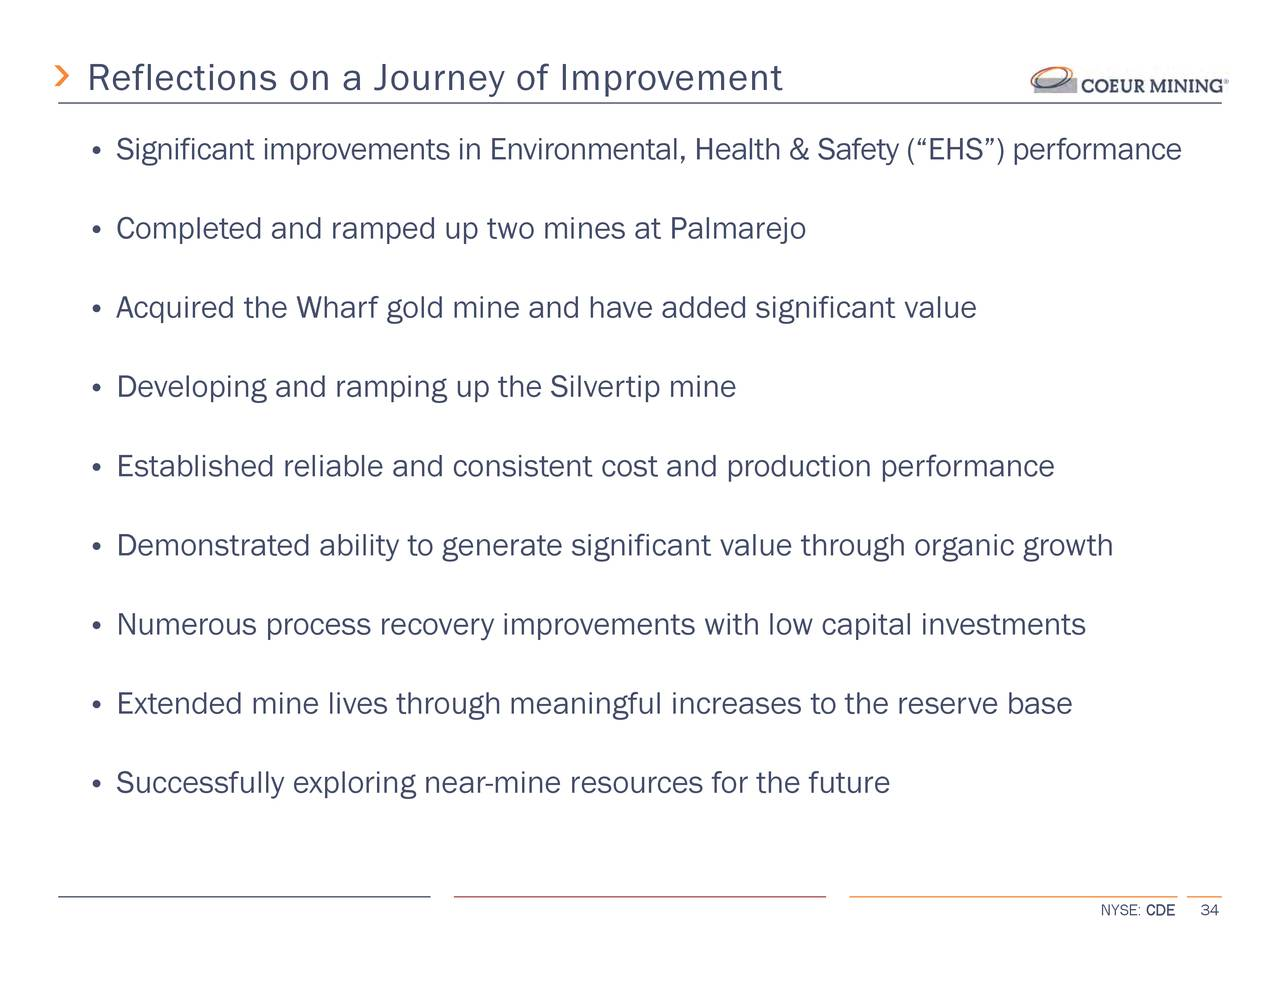 Coeur Mining (CDE) Investor Presentation - Slideshow - Coeur Mining